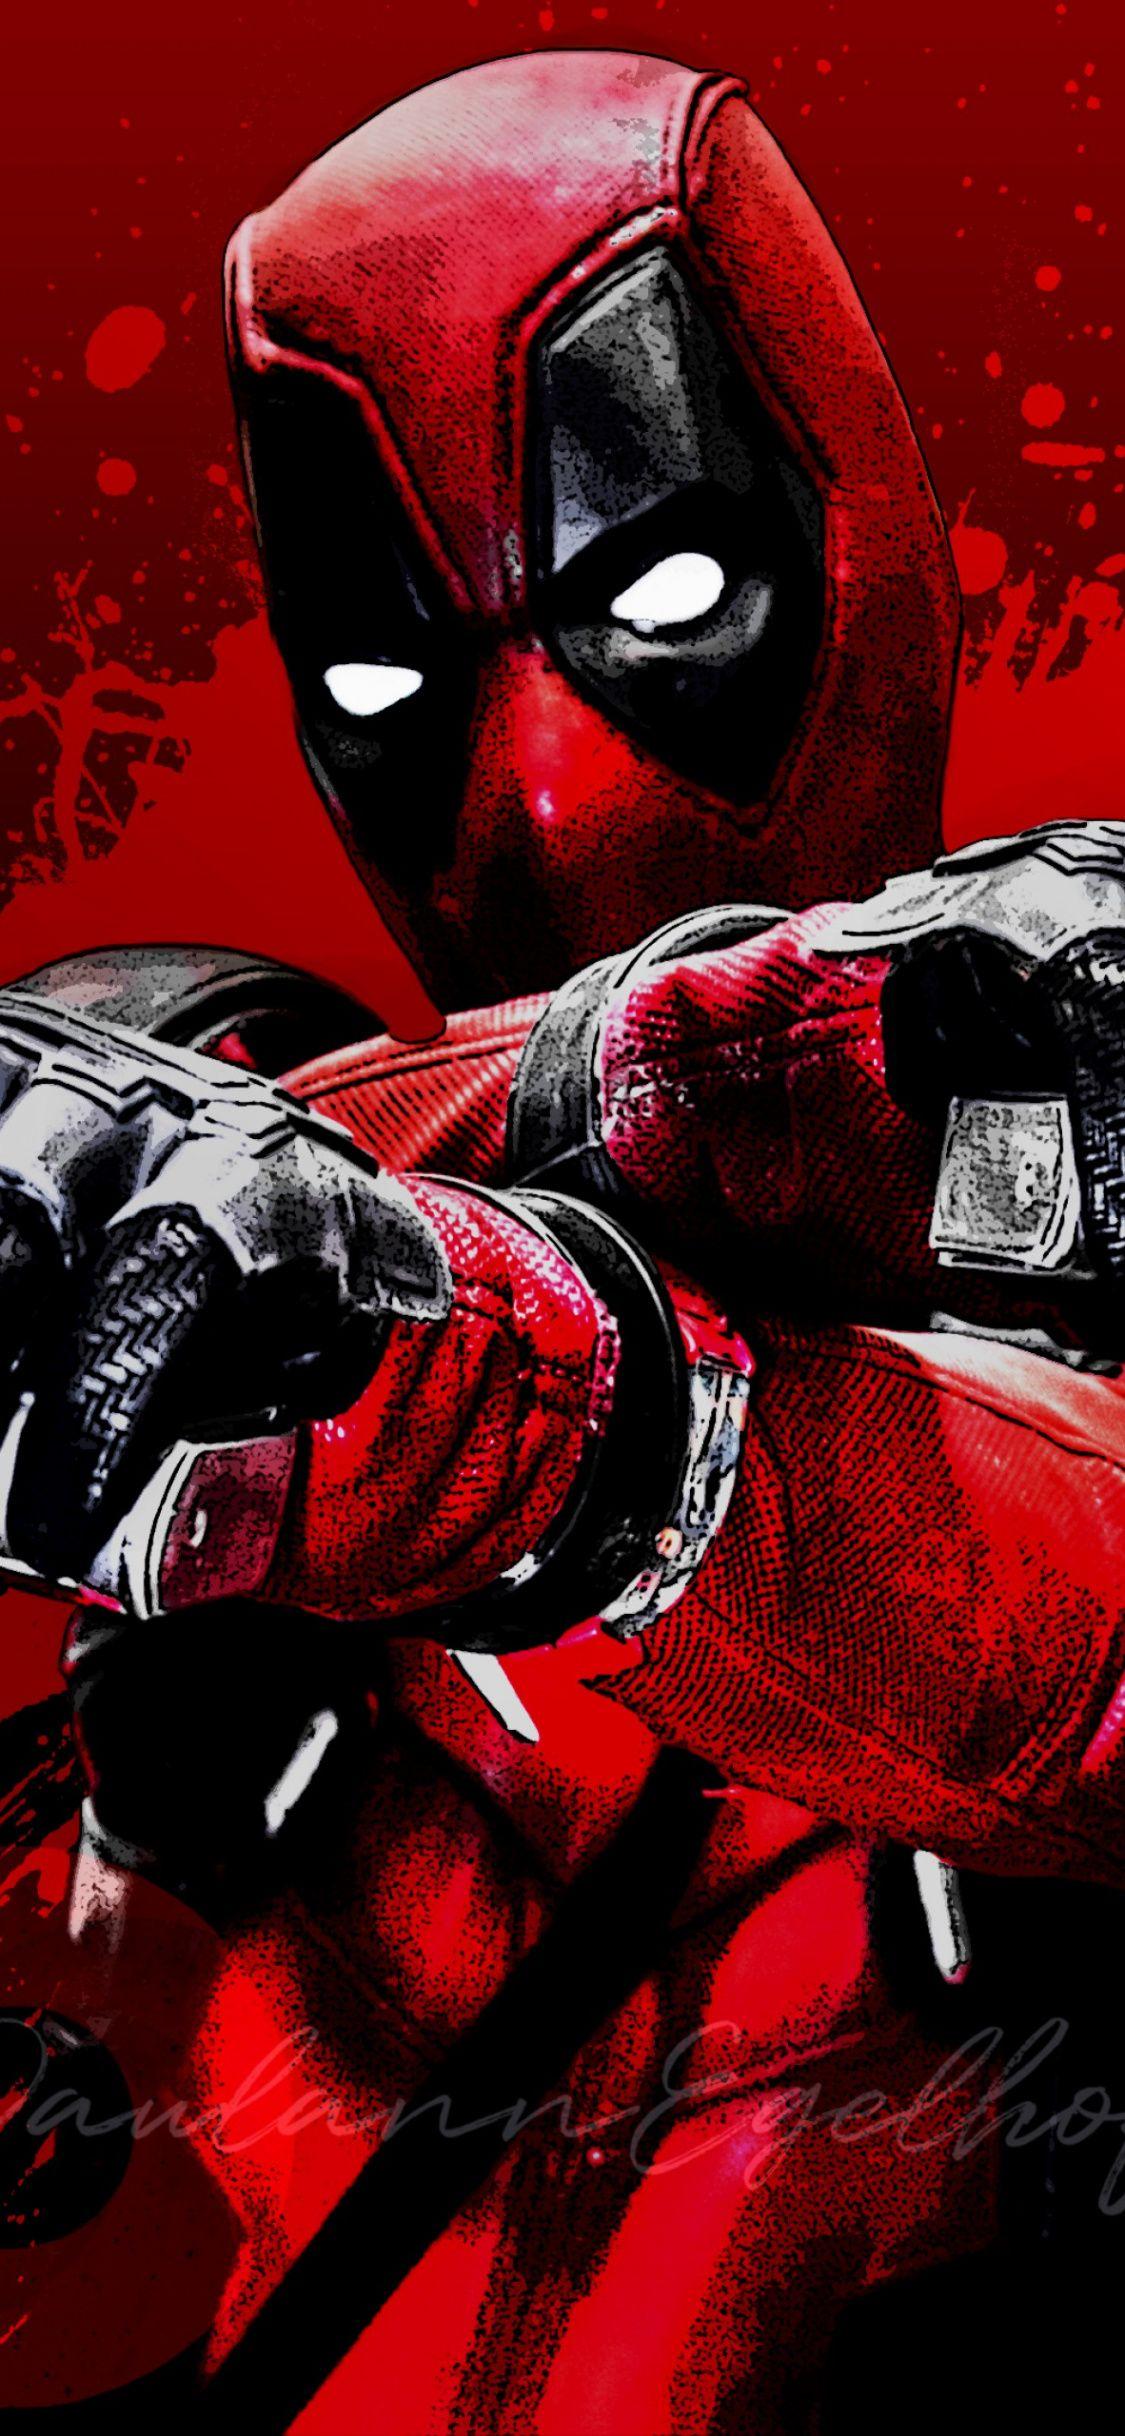 1125x2436 Fictional Character Superhero Movie Deadpool Film Graphics Wallpaper For Iph Deadpool Wallpaper Deadpool Wallpaper Iphone Marvel Comics Wallpaper